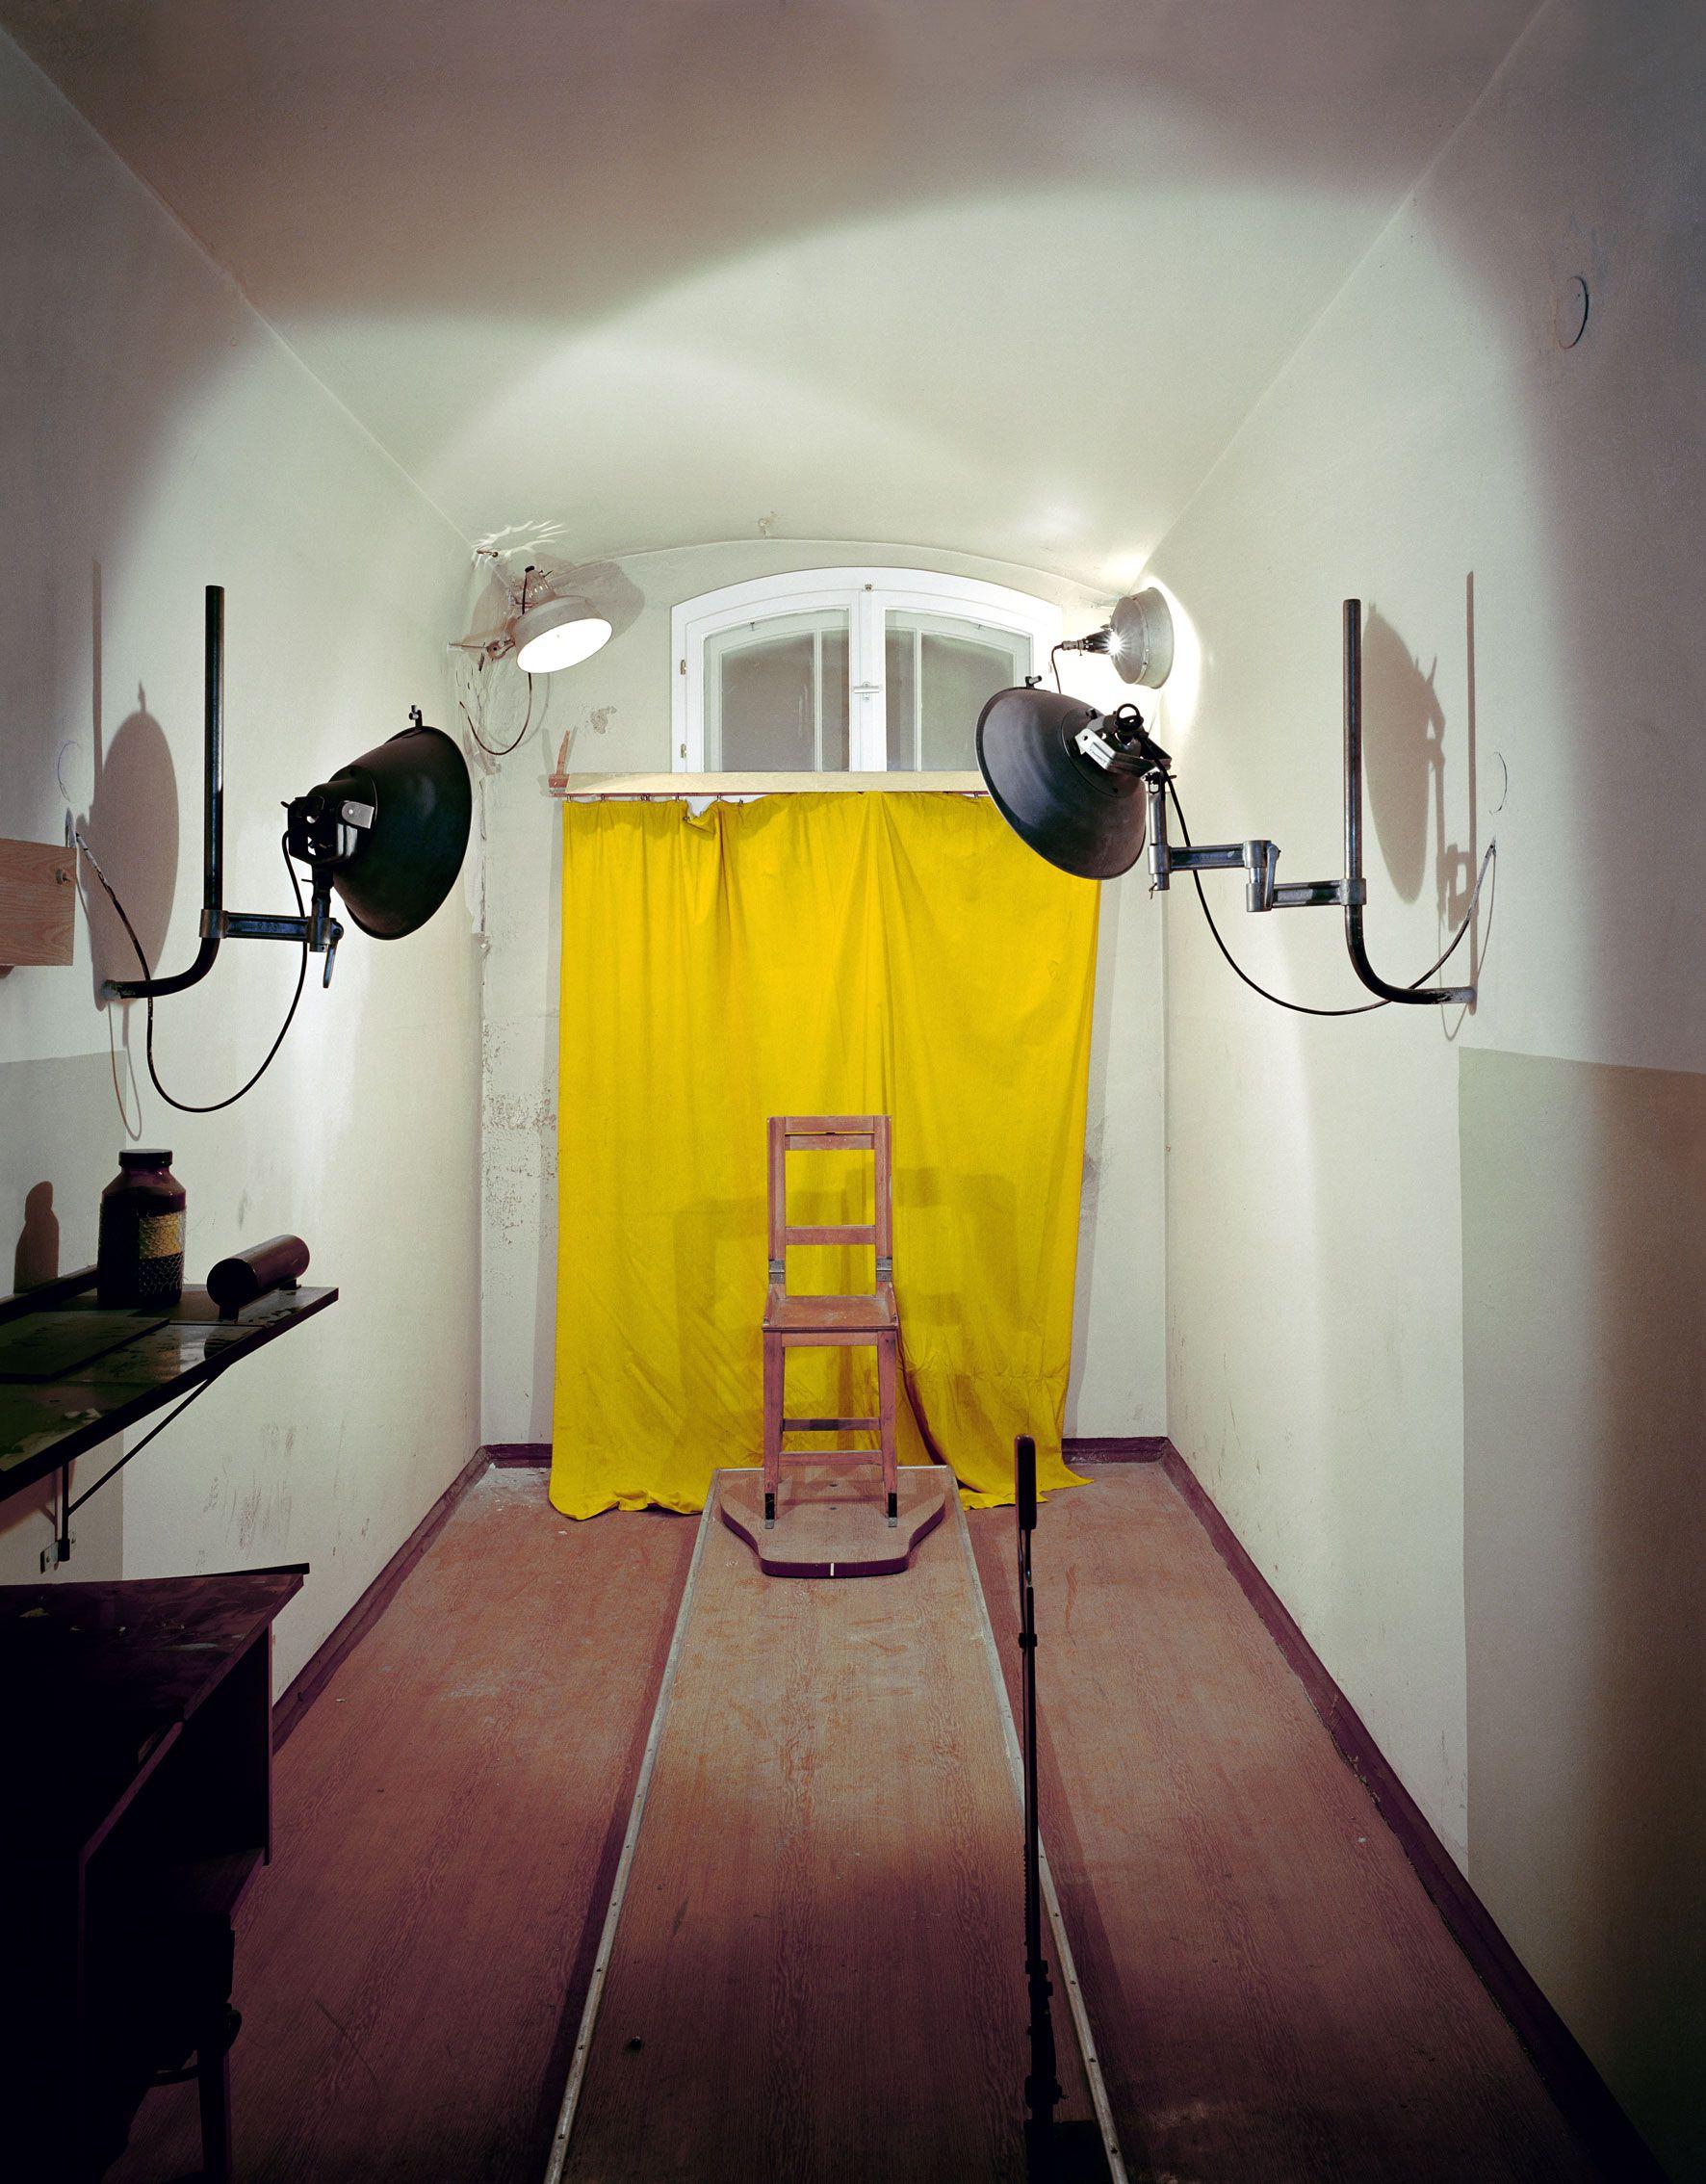 A former Stasi prison in Potsdam